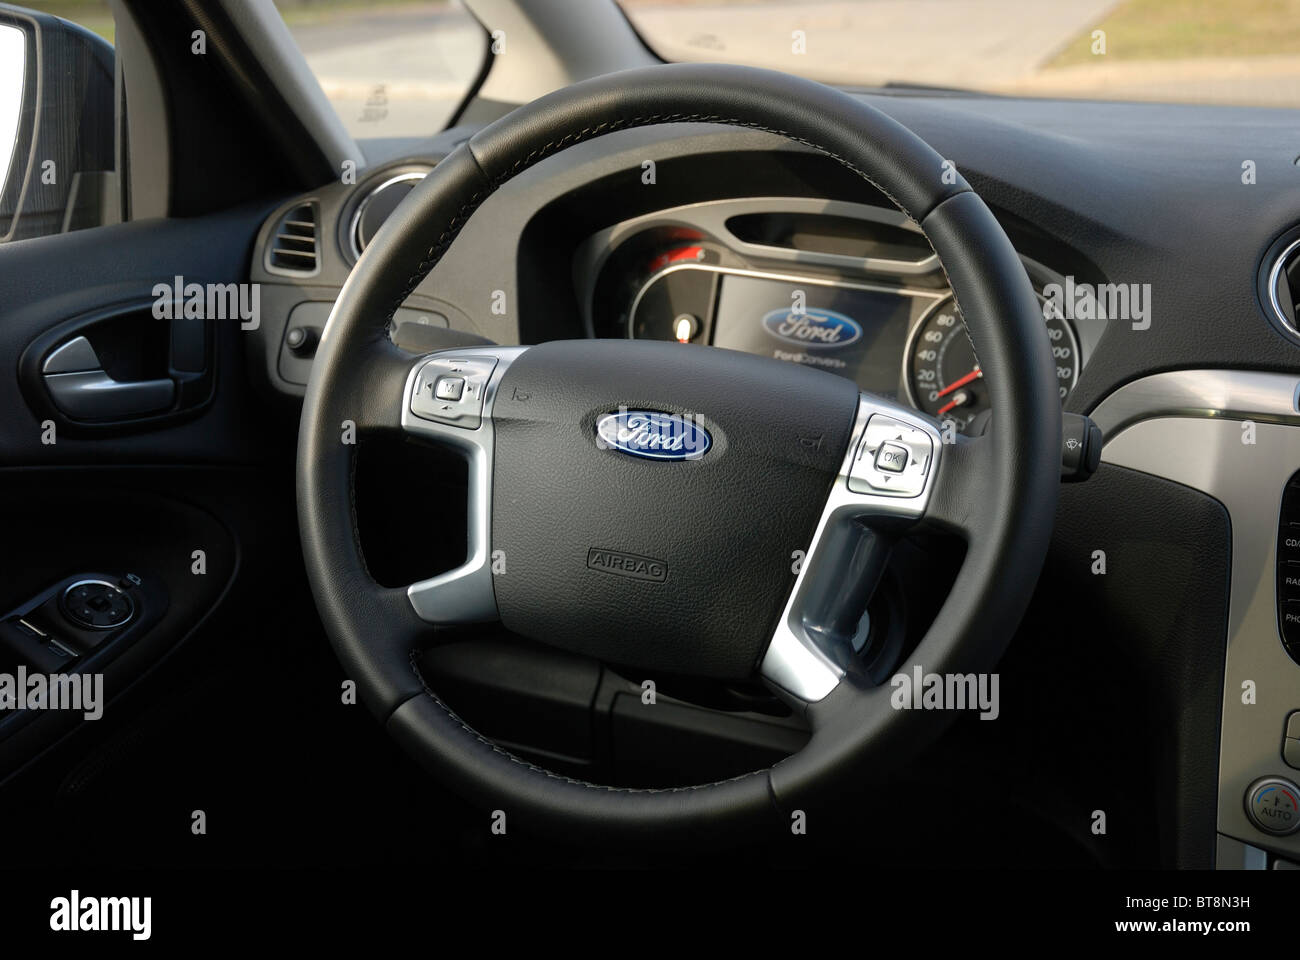 Ford S-MAX 2.0 TDCI - 2006 - schwarz Metallic - fünf Türen (5D ...